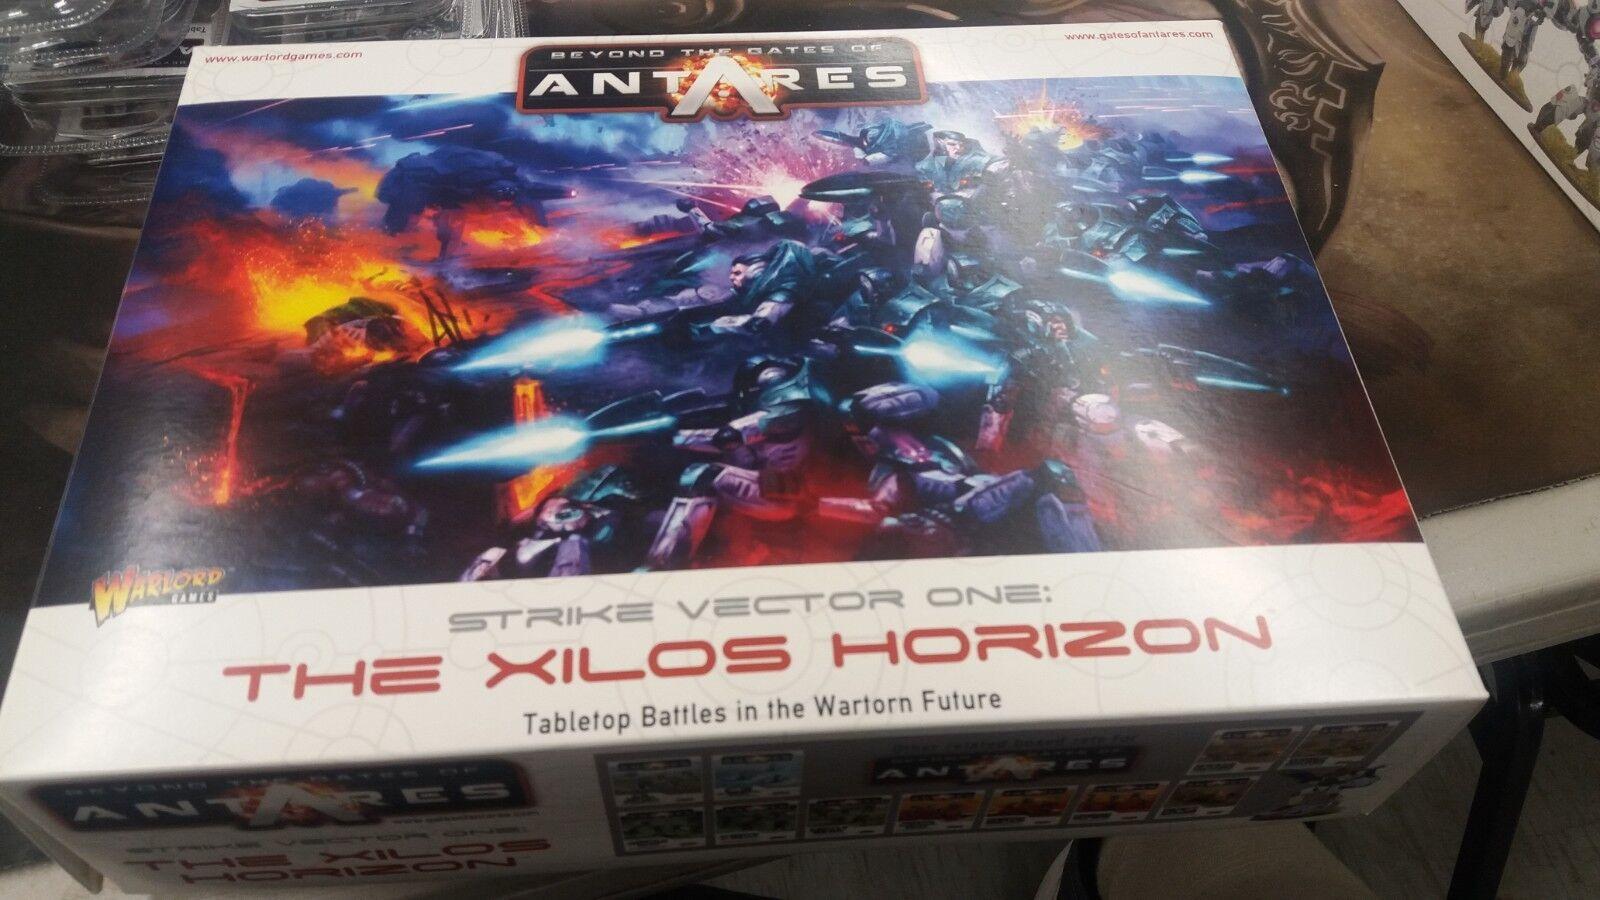 Beyond the Gates of Antares  Strike Vector One - The Xilos Horizon